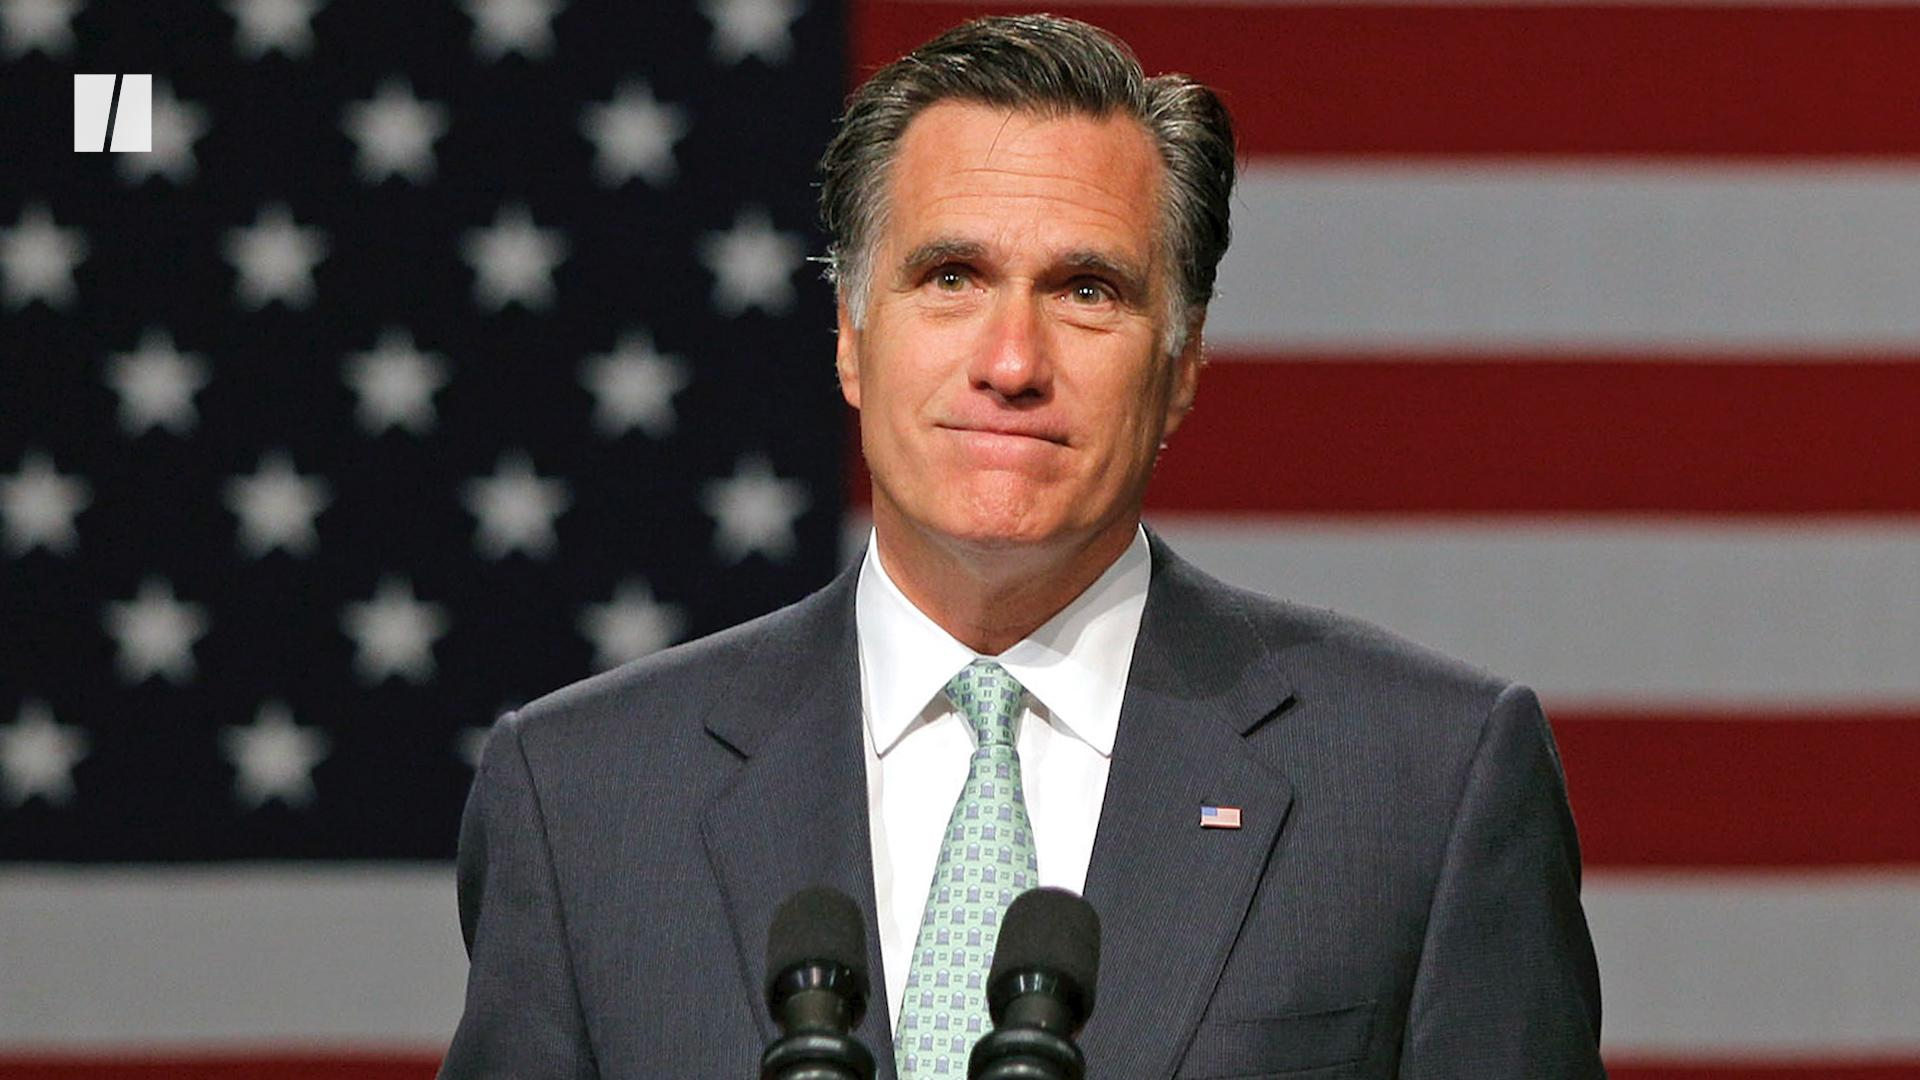 Will Mitt Romney Face Punishment For Having A Conscience?